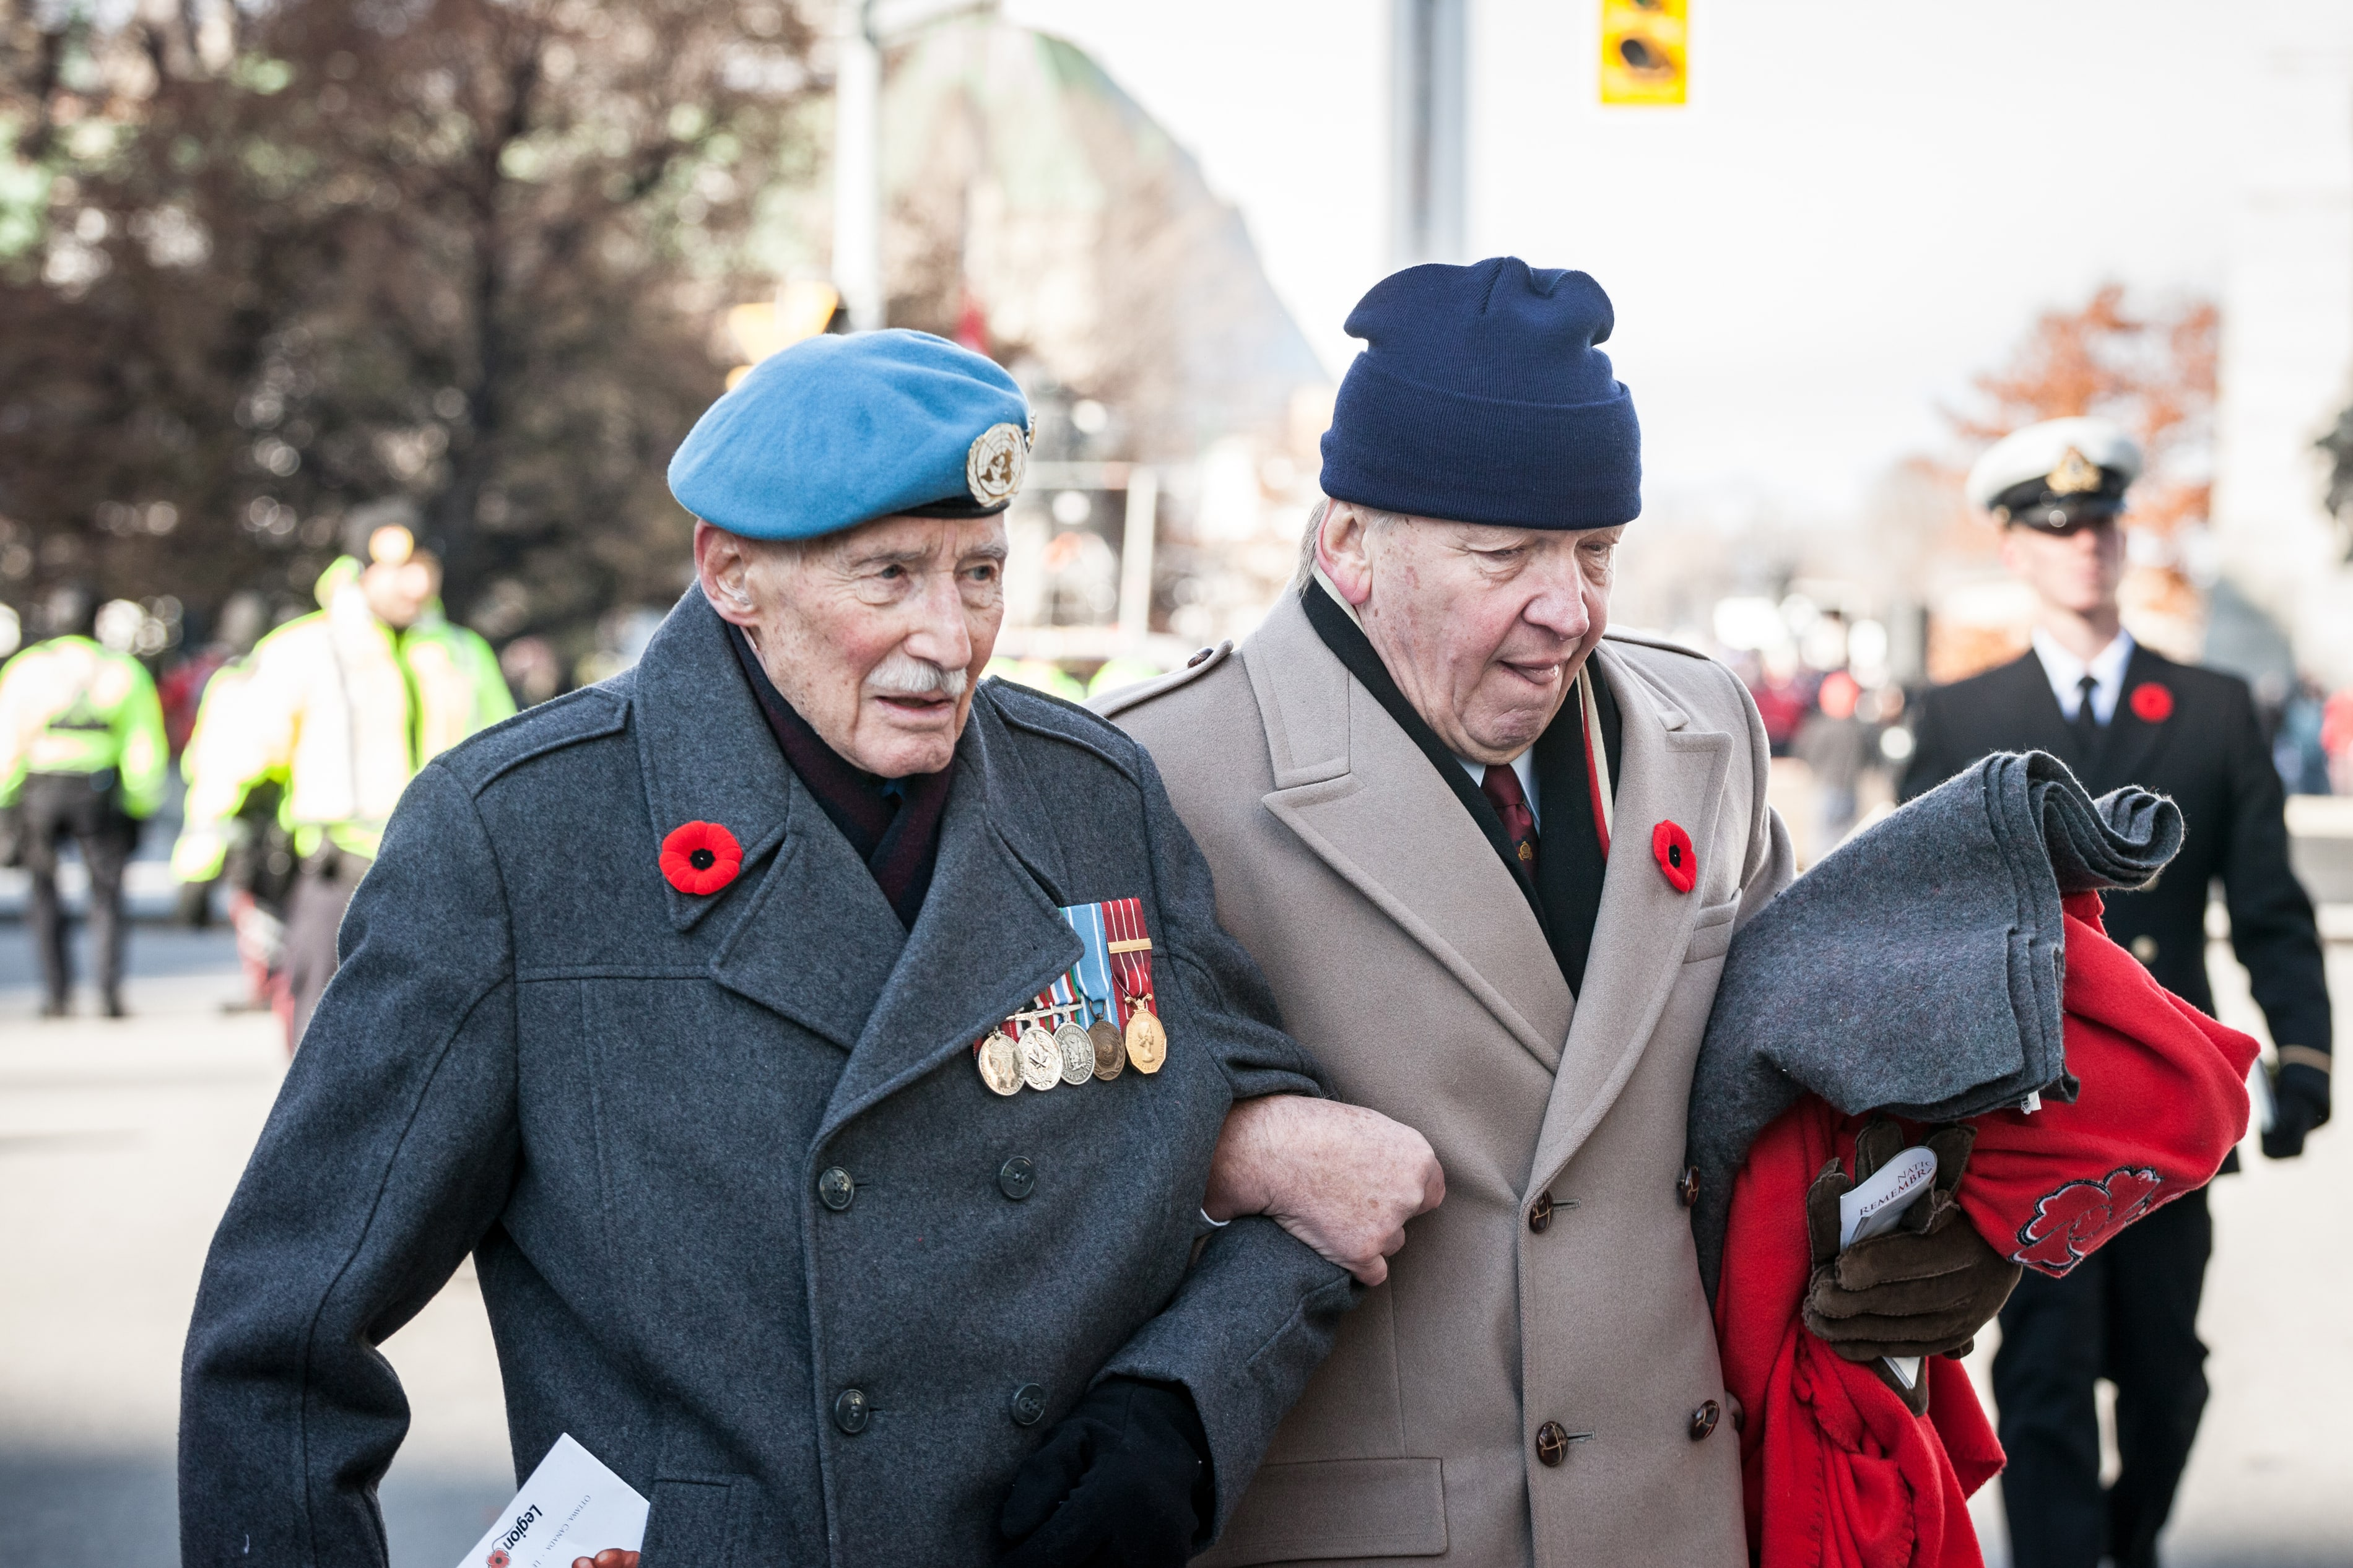 Veterans wearing poppies